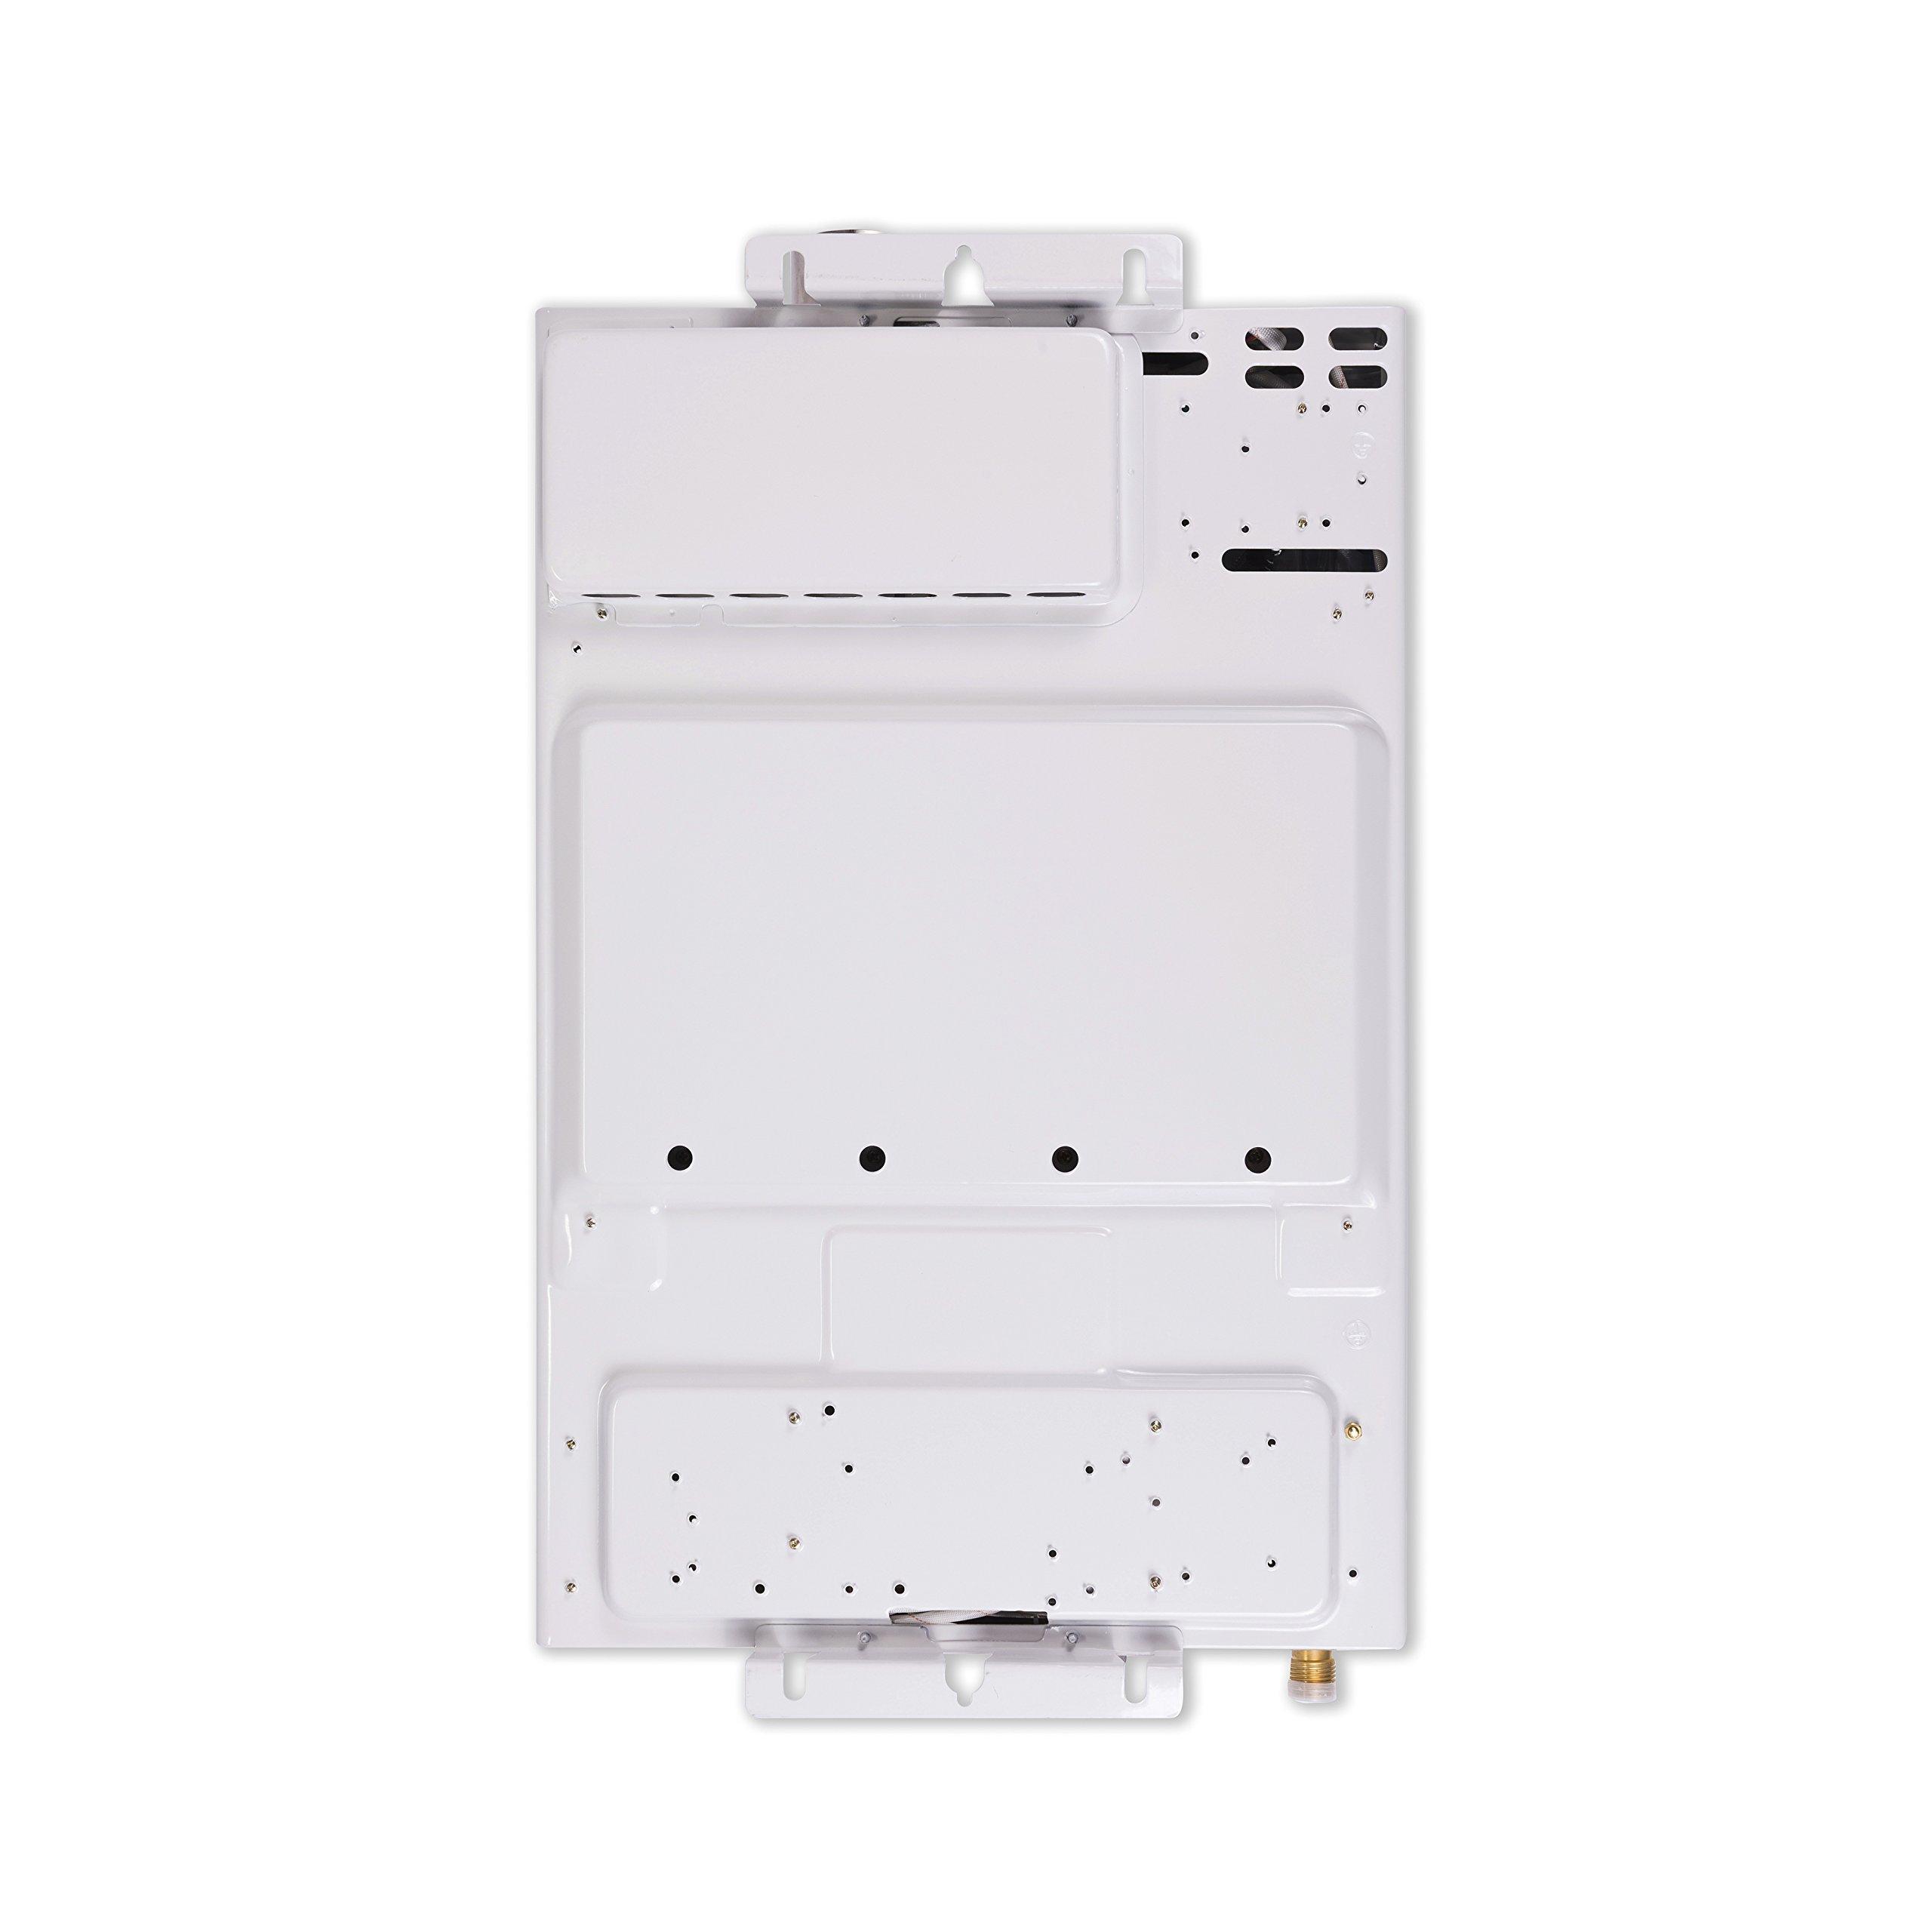 Eccotemp fvi12-NG FVI-12 Natural Gas, 3.5 GPM, High Capacity Tankless Water Heater, White by Eccotemp (Image #2)